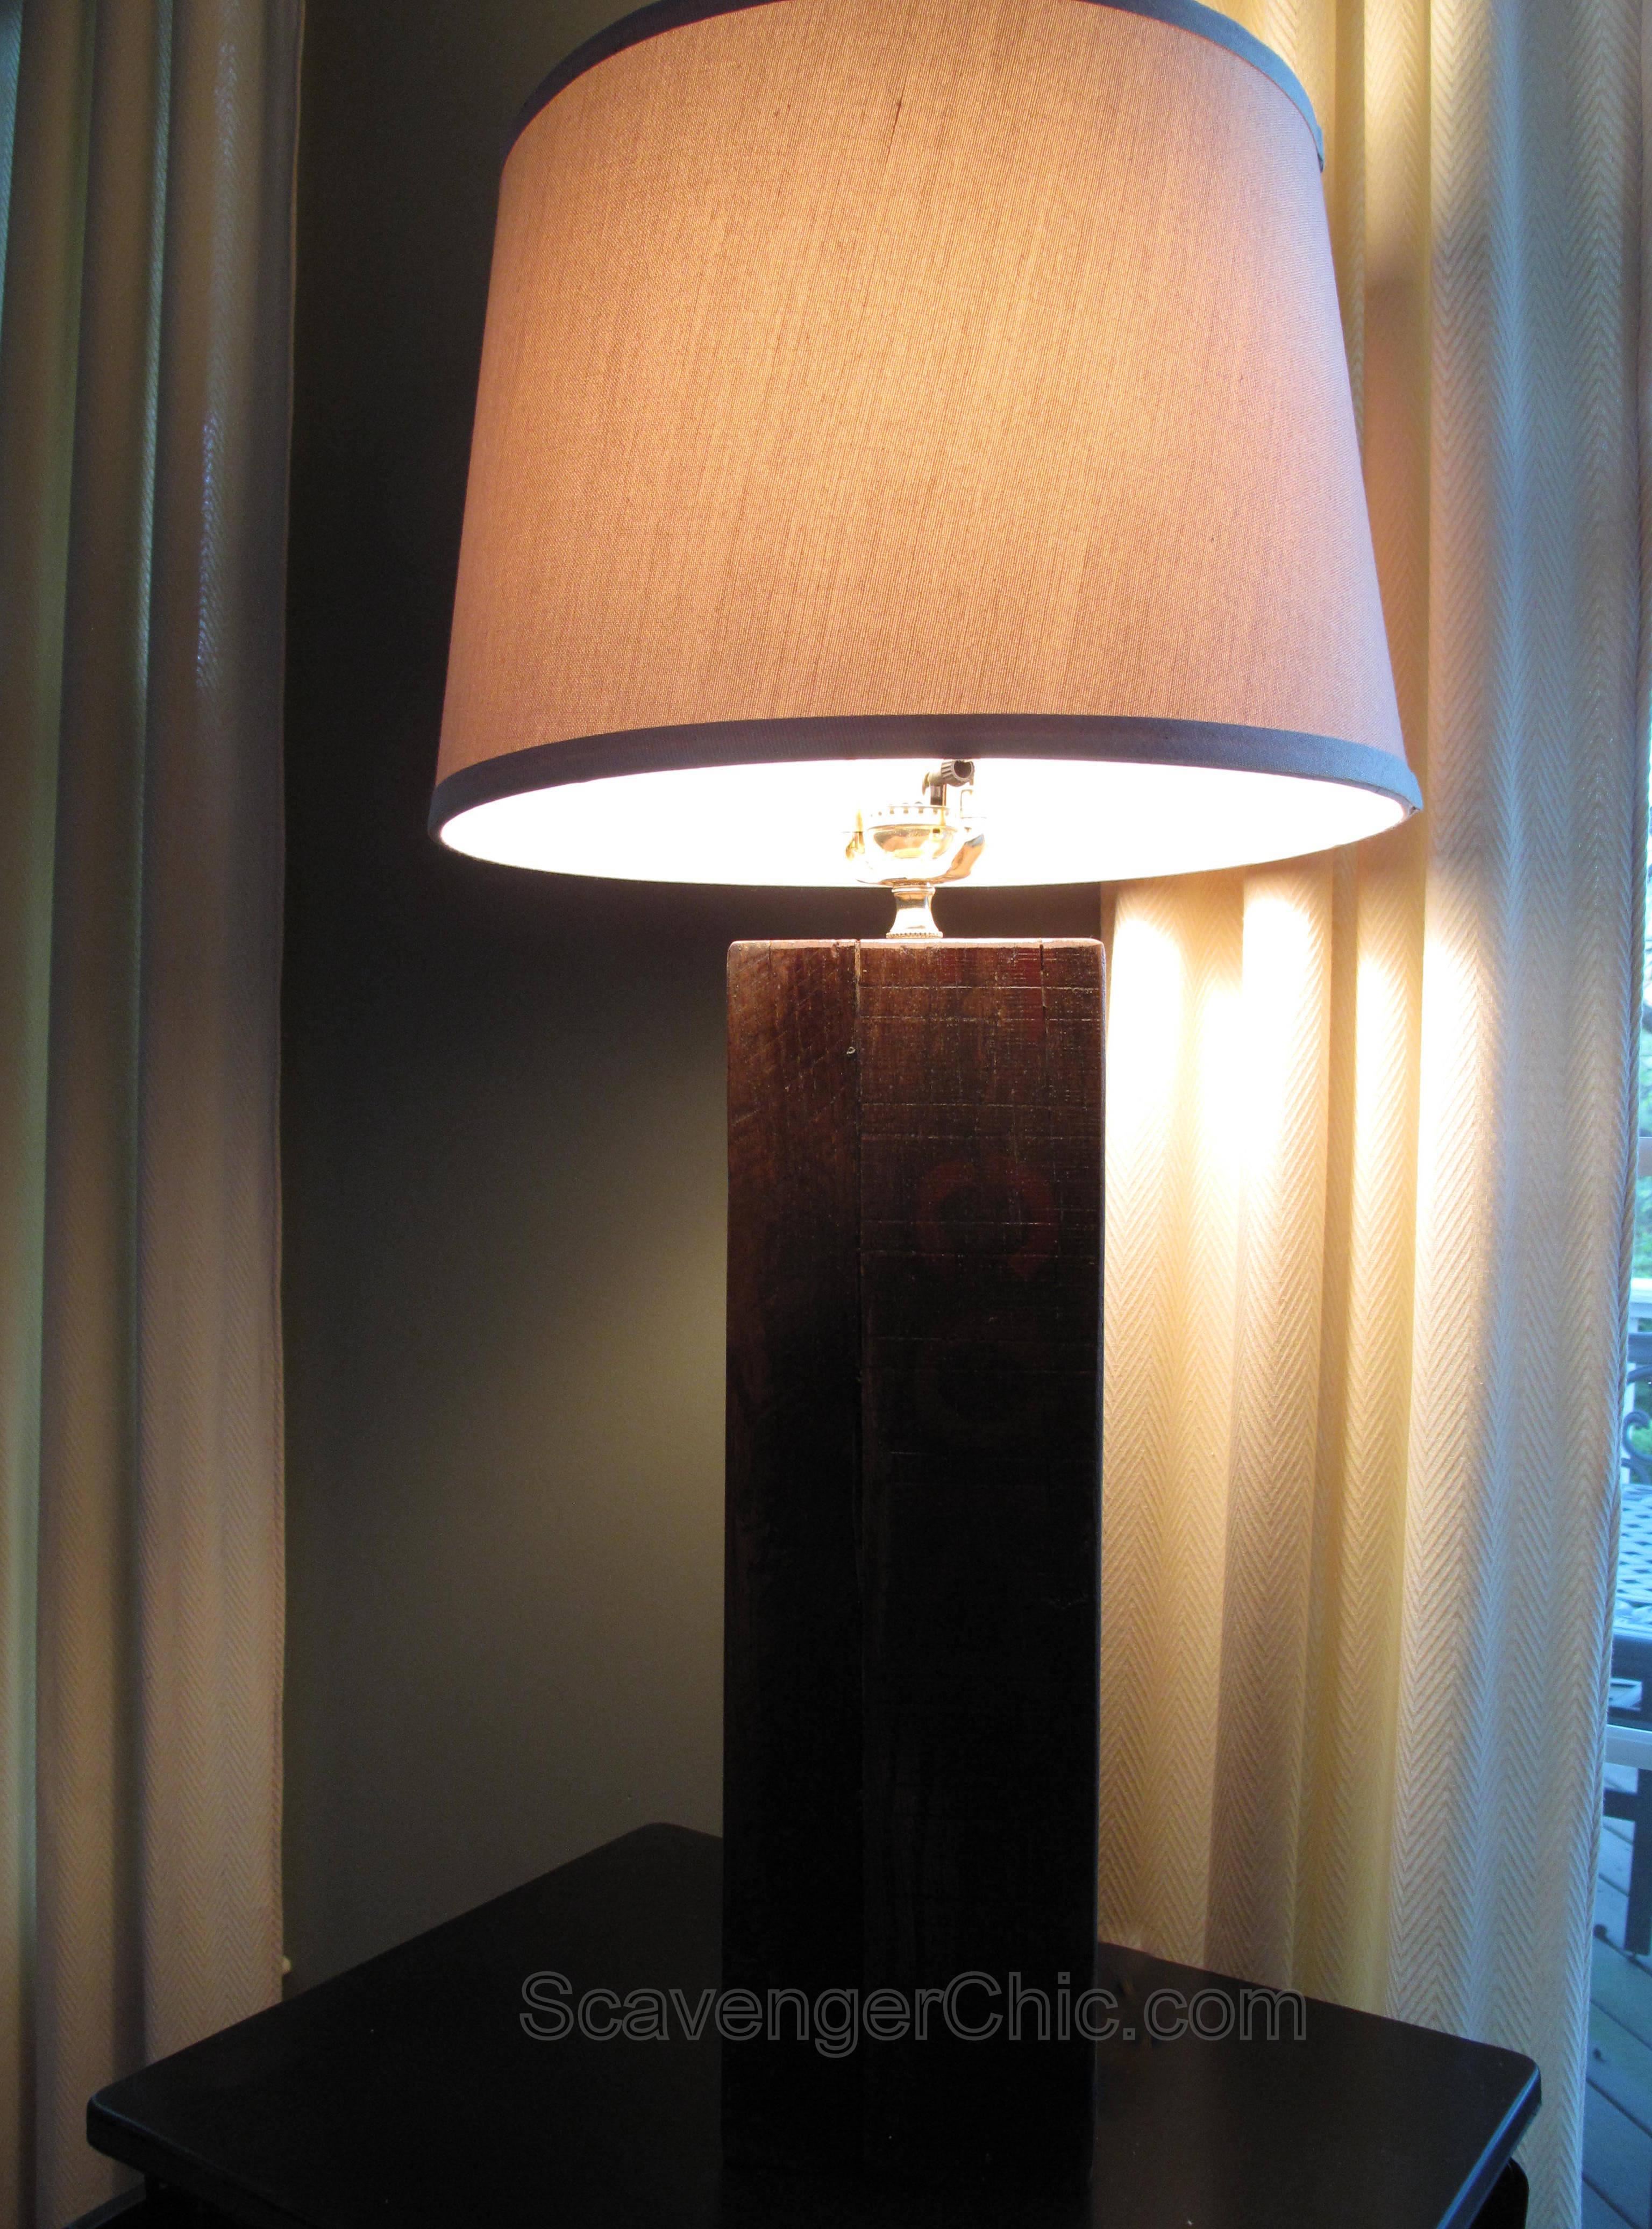 Rustic Pallet Wood Lamp Scavenger Chic